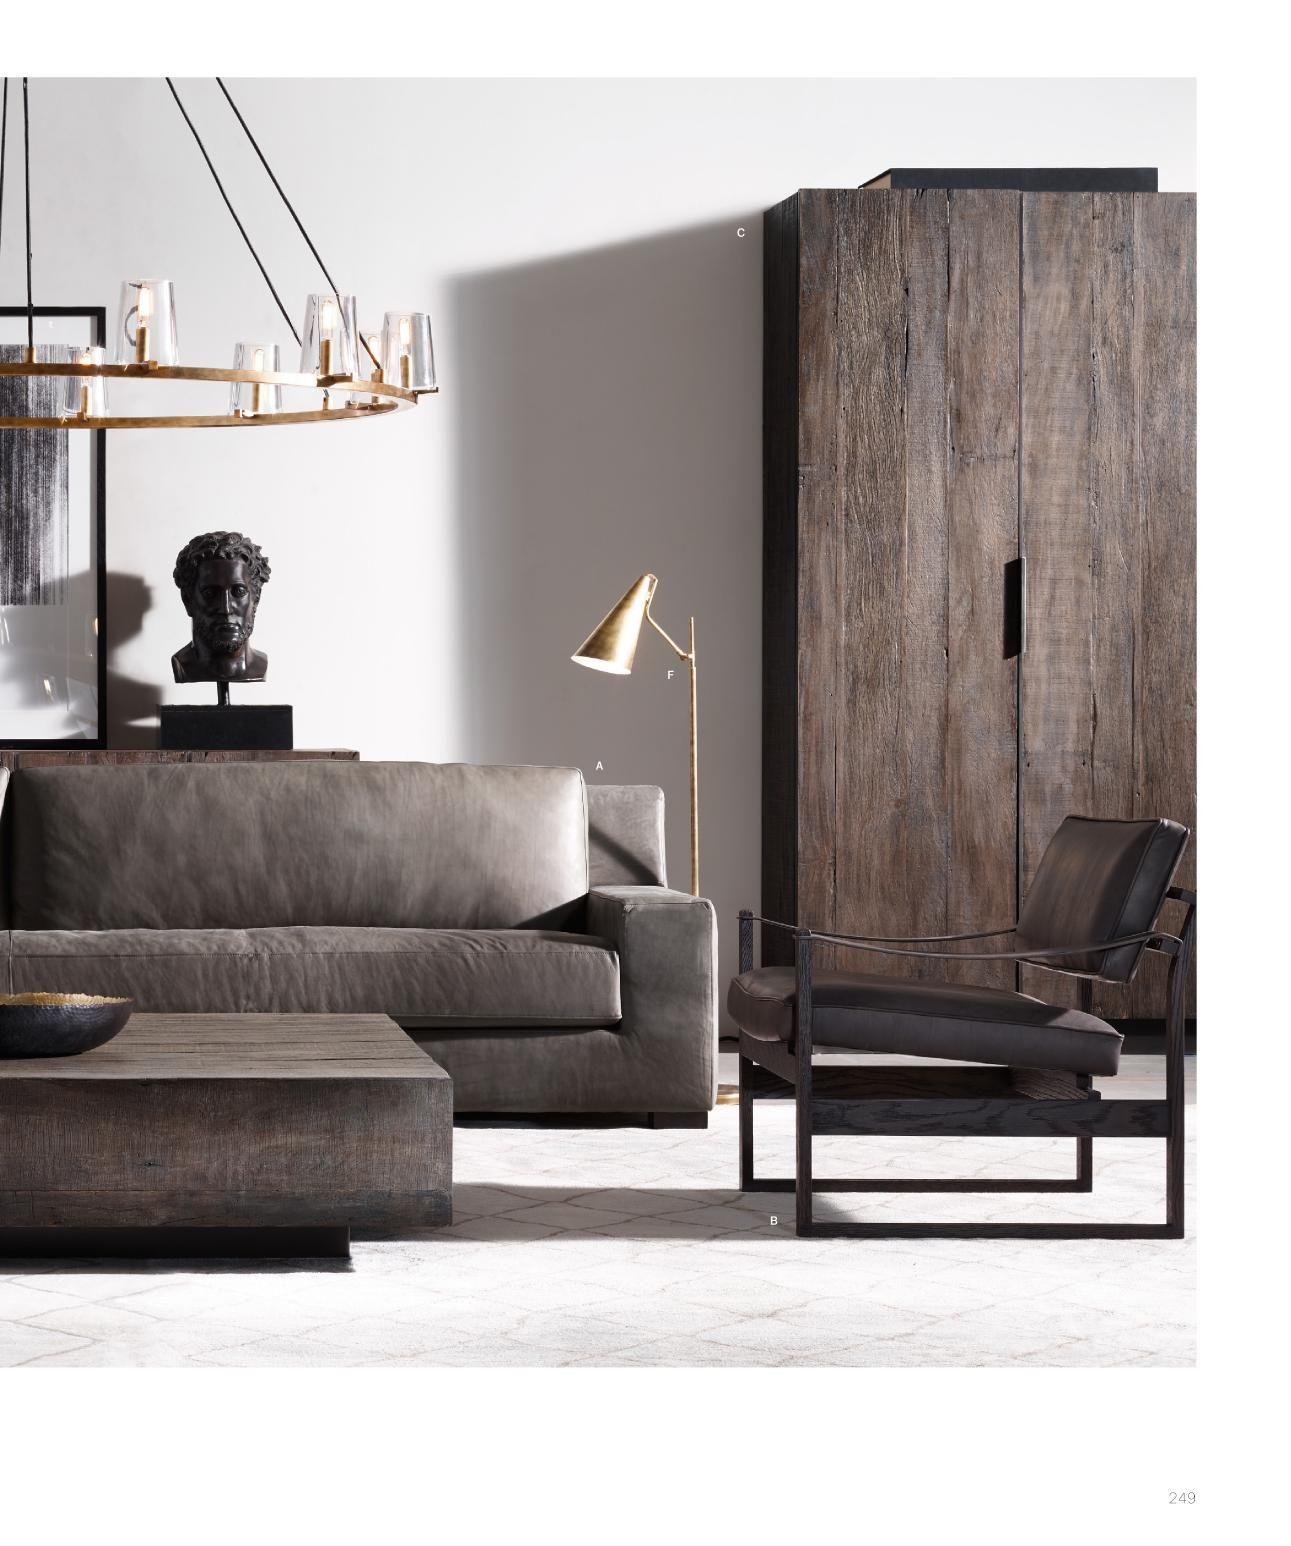 rh source books  luxury interior living room interior